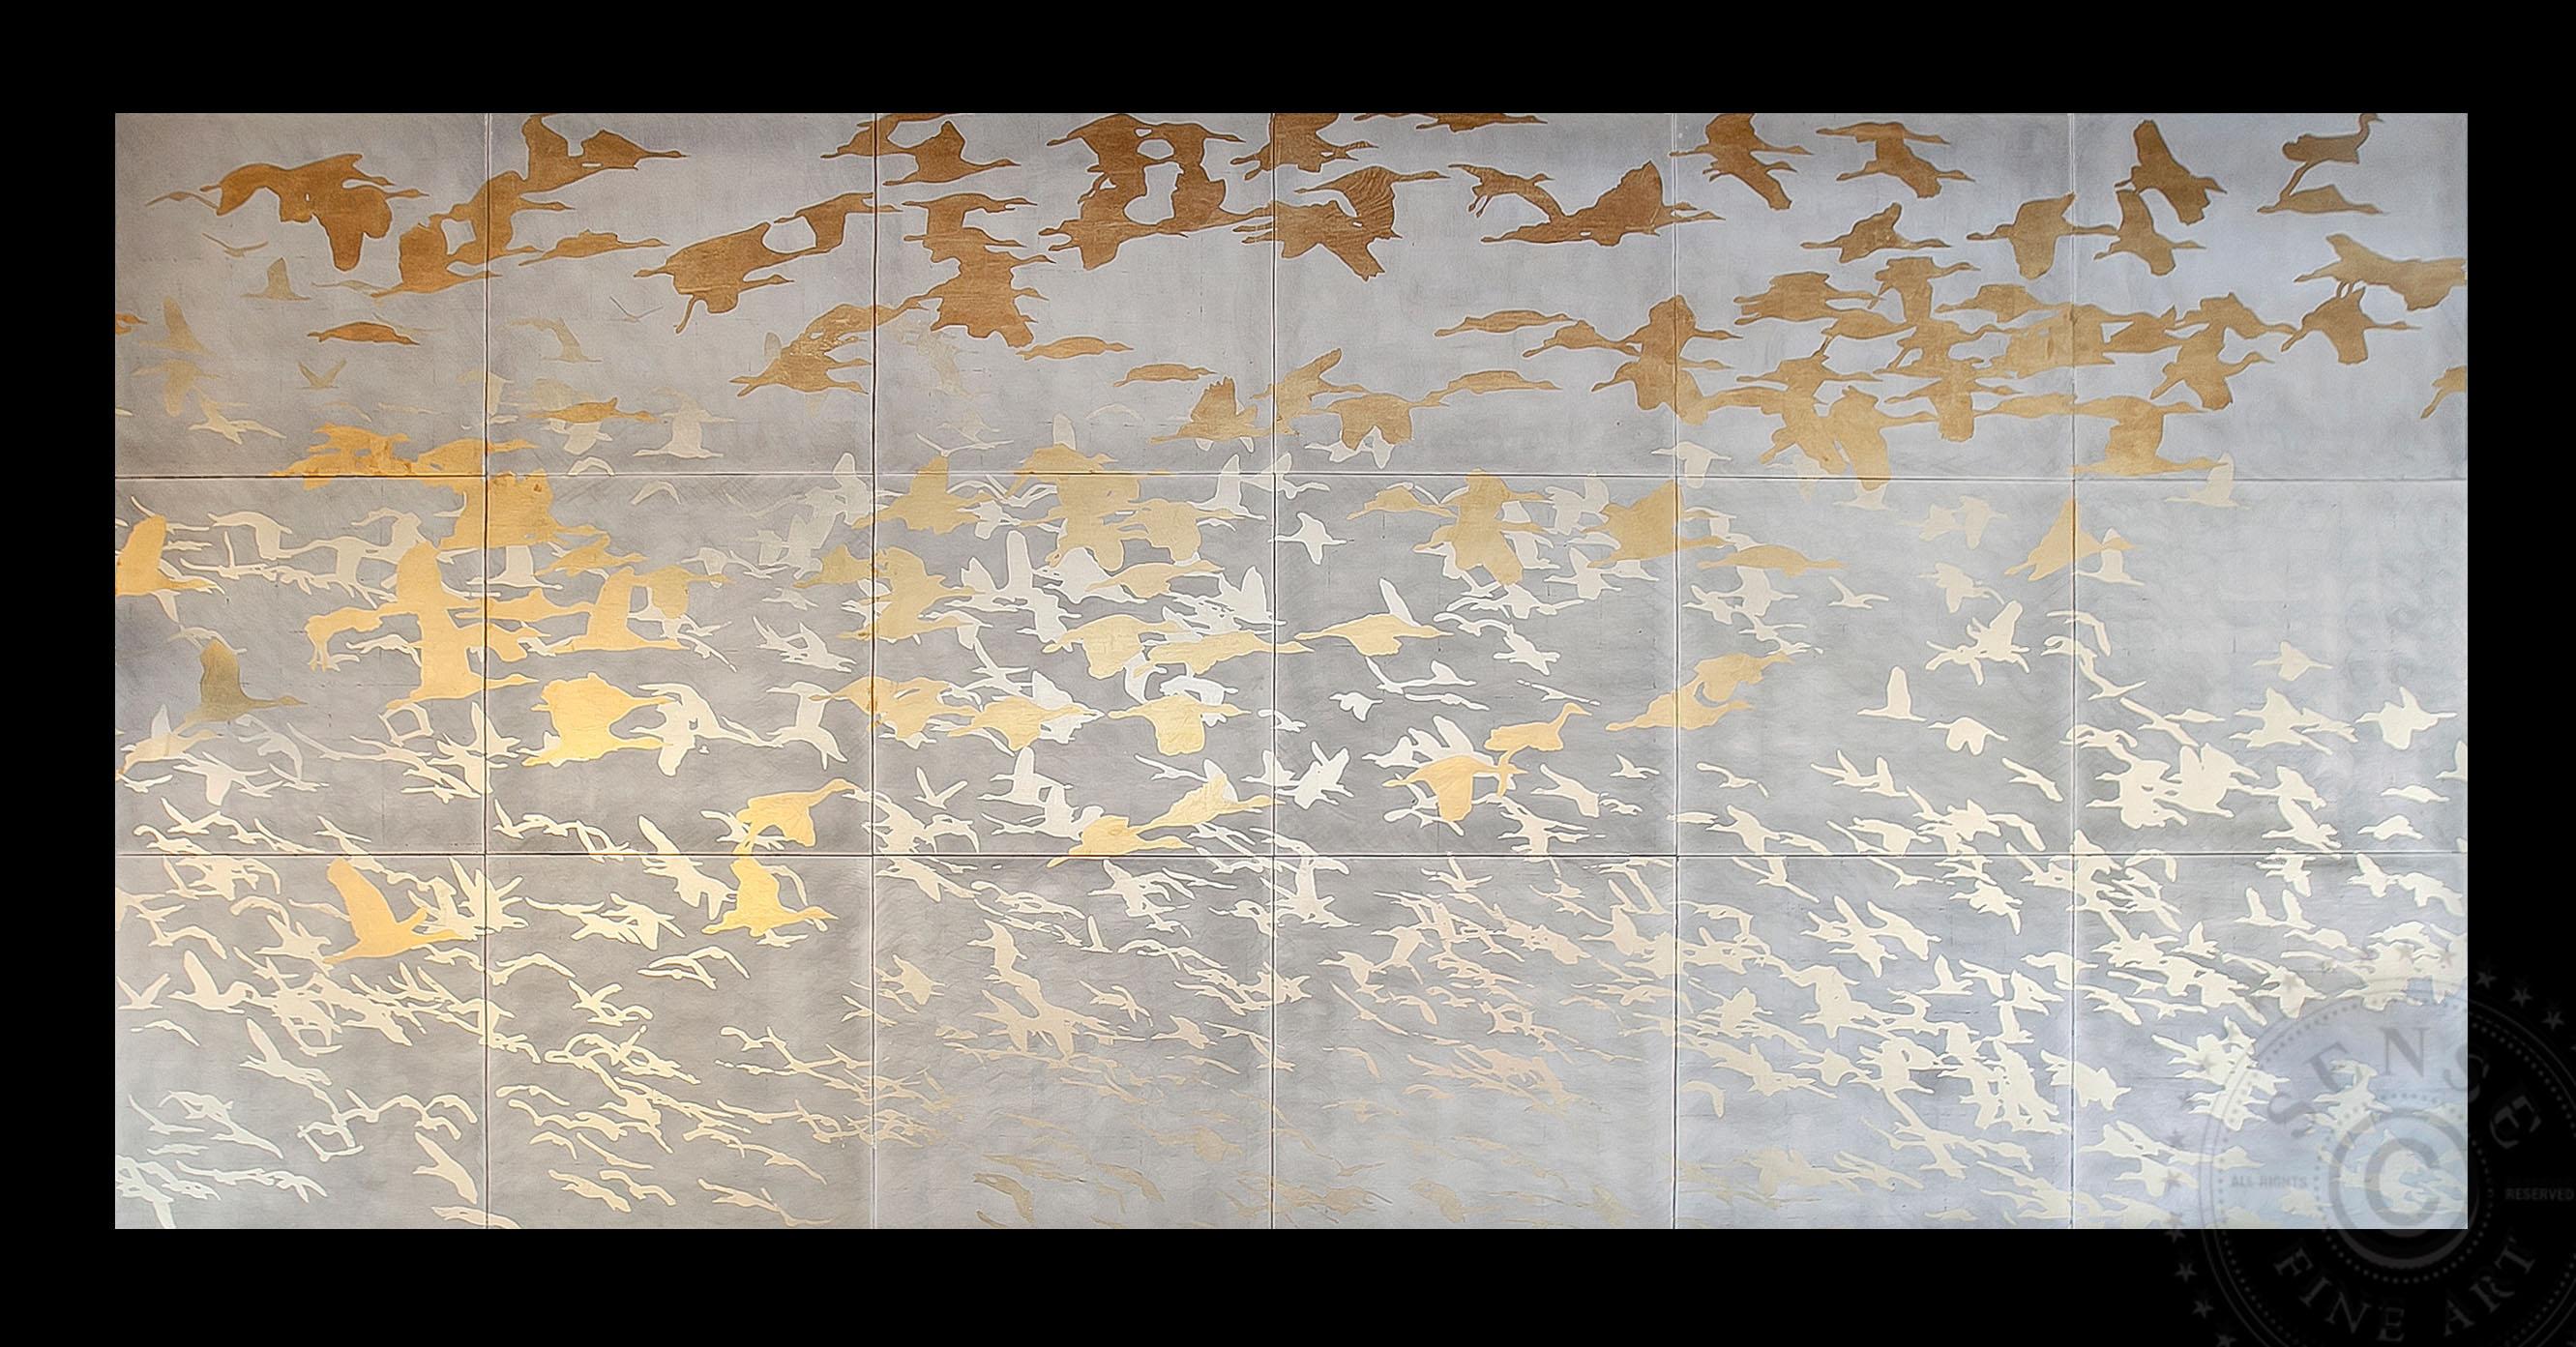 SENSE_fine_art_Swanston_MonumentS_